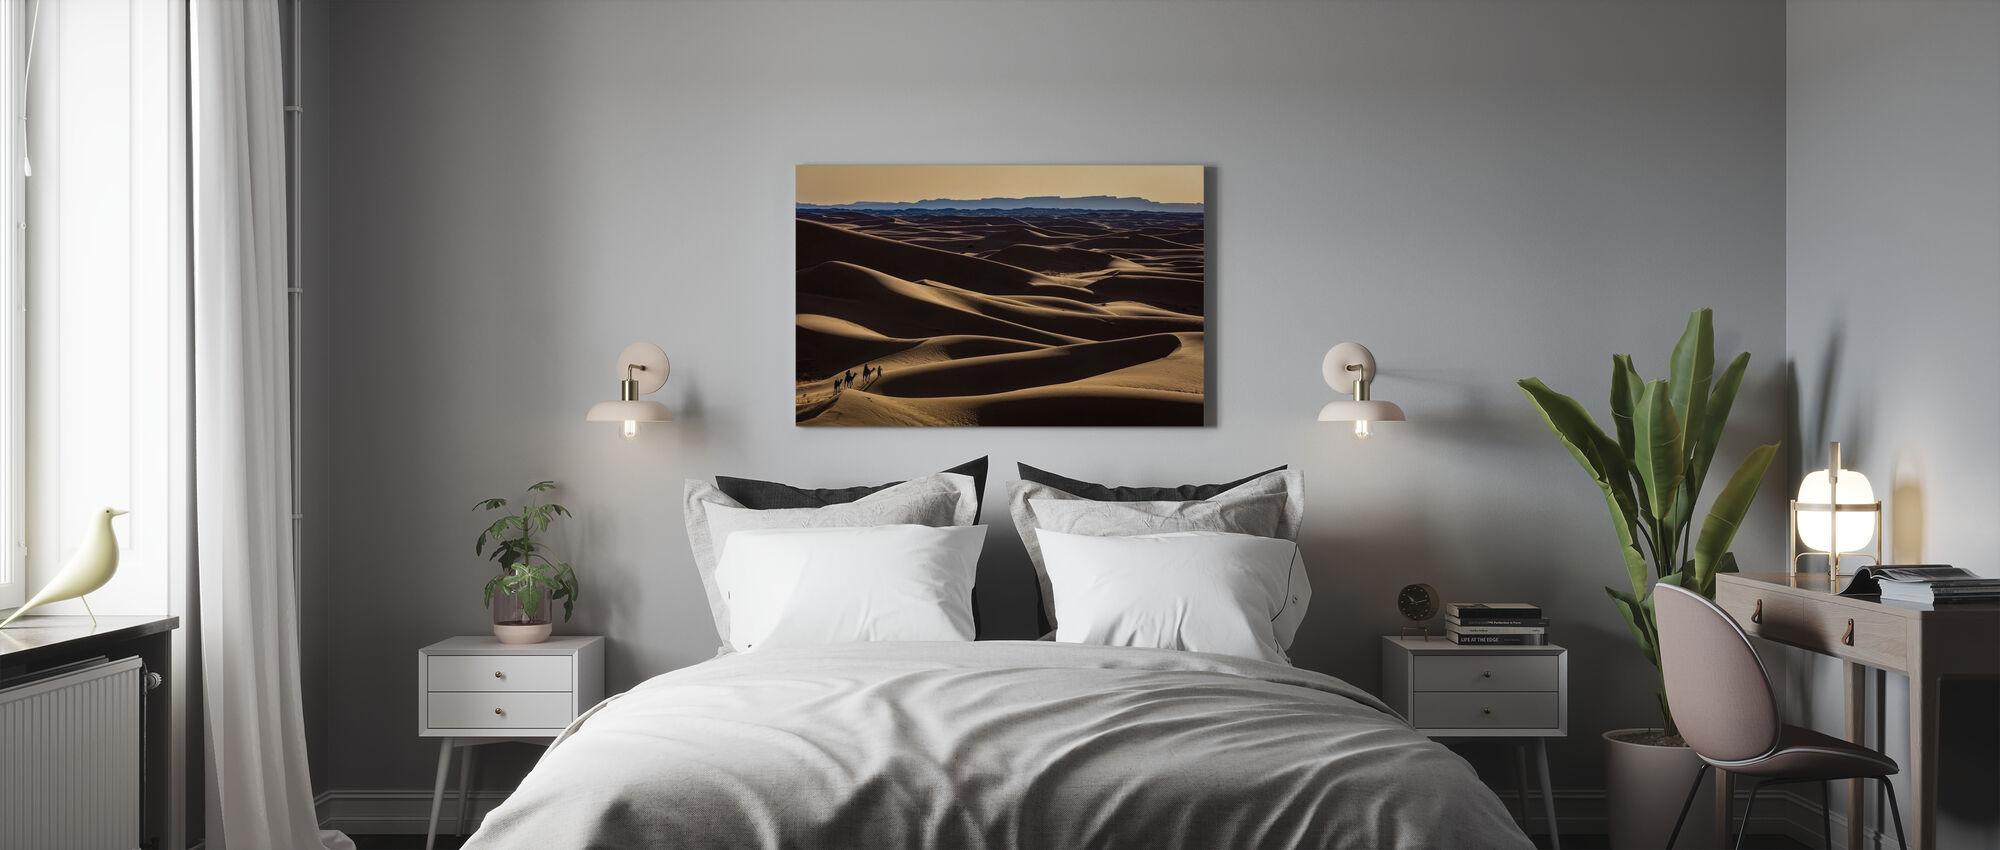 Caravan - Canvas print - Bedroom